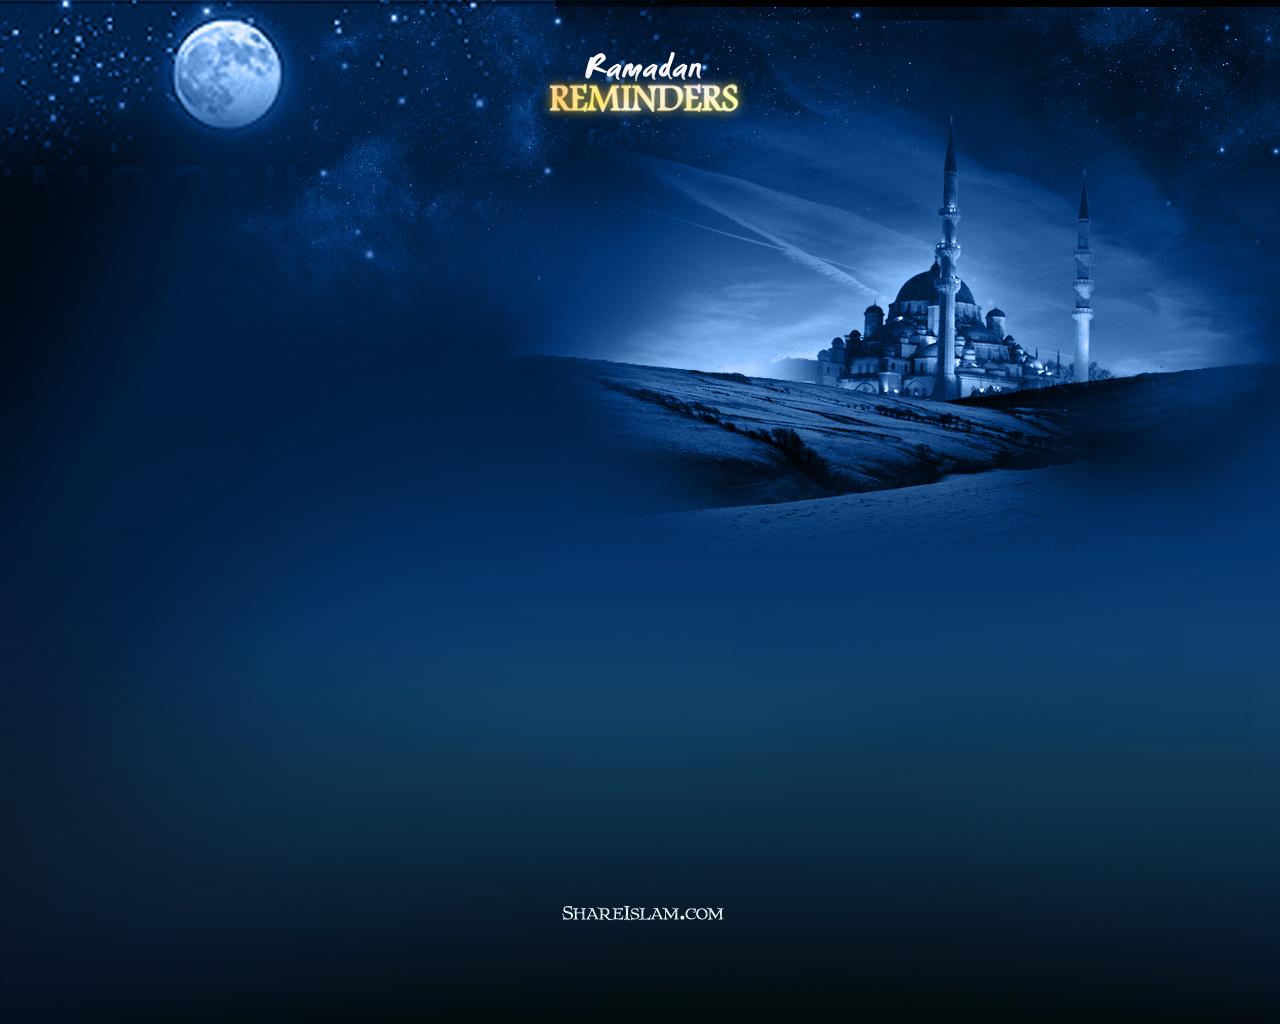 Best Reminder Ramadan Wallpaper - ShareIslam_Ramadan_05_1280x1024  Pictures_155028 .jpg